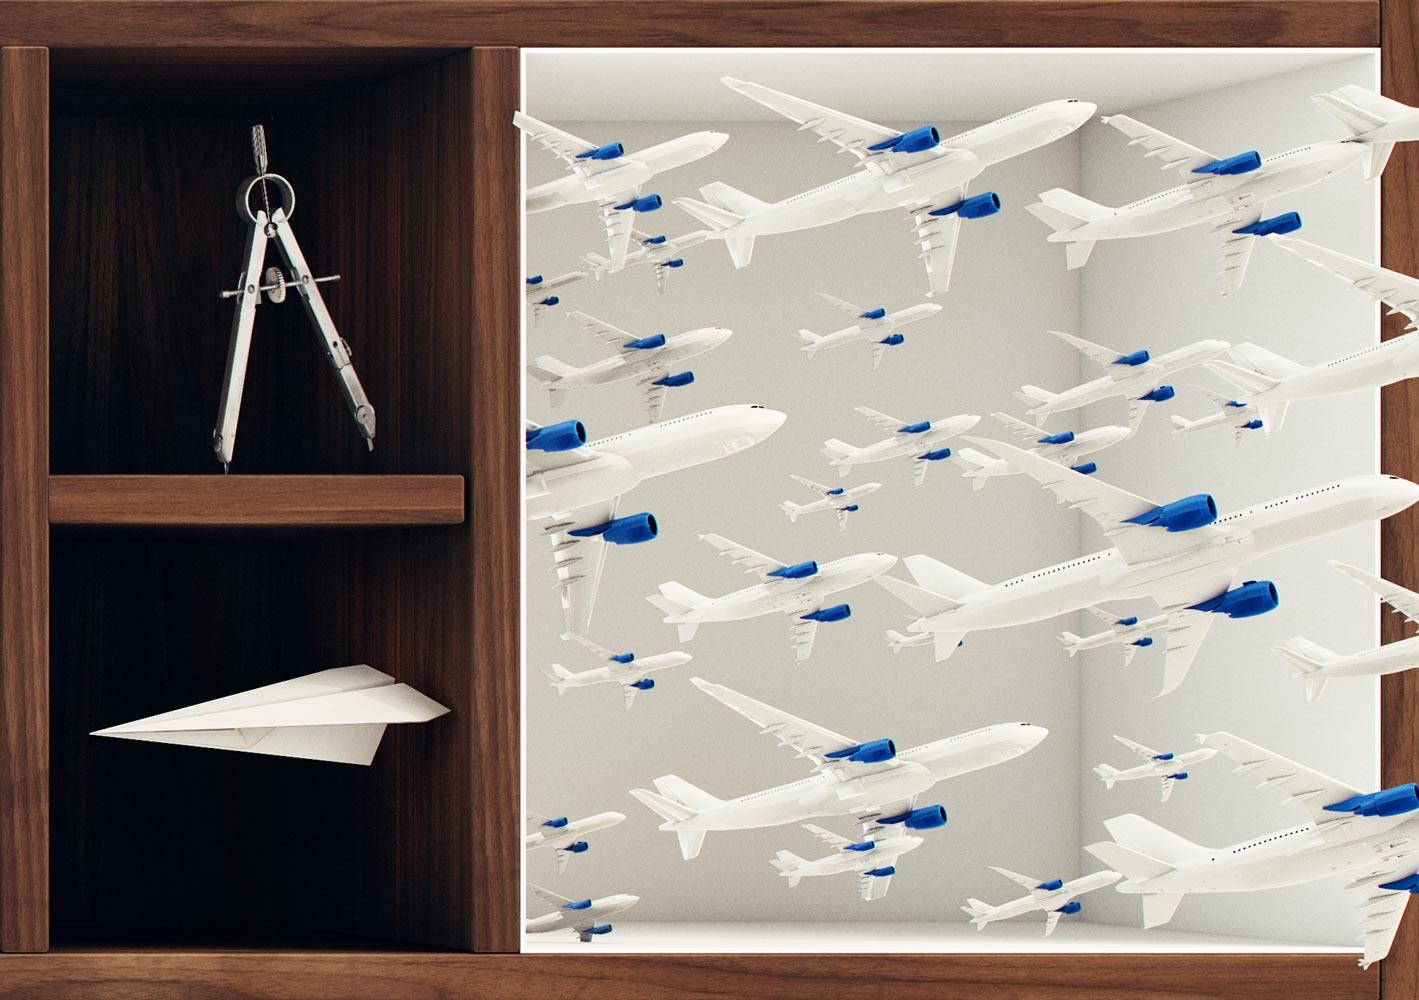 GE_LittleRedRobot_Aviation_Planes.jpg